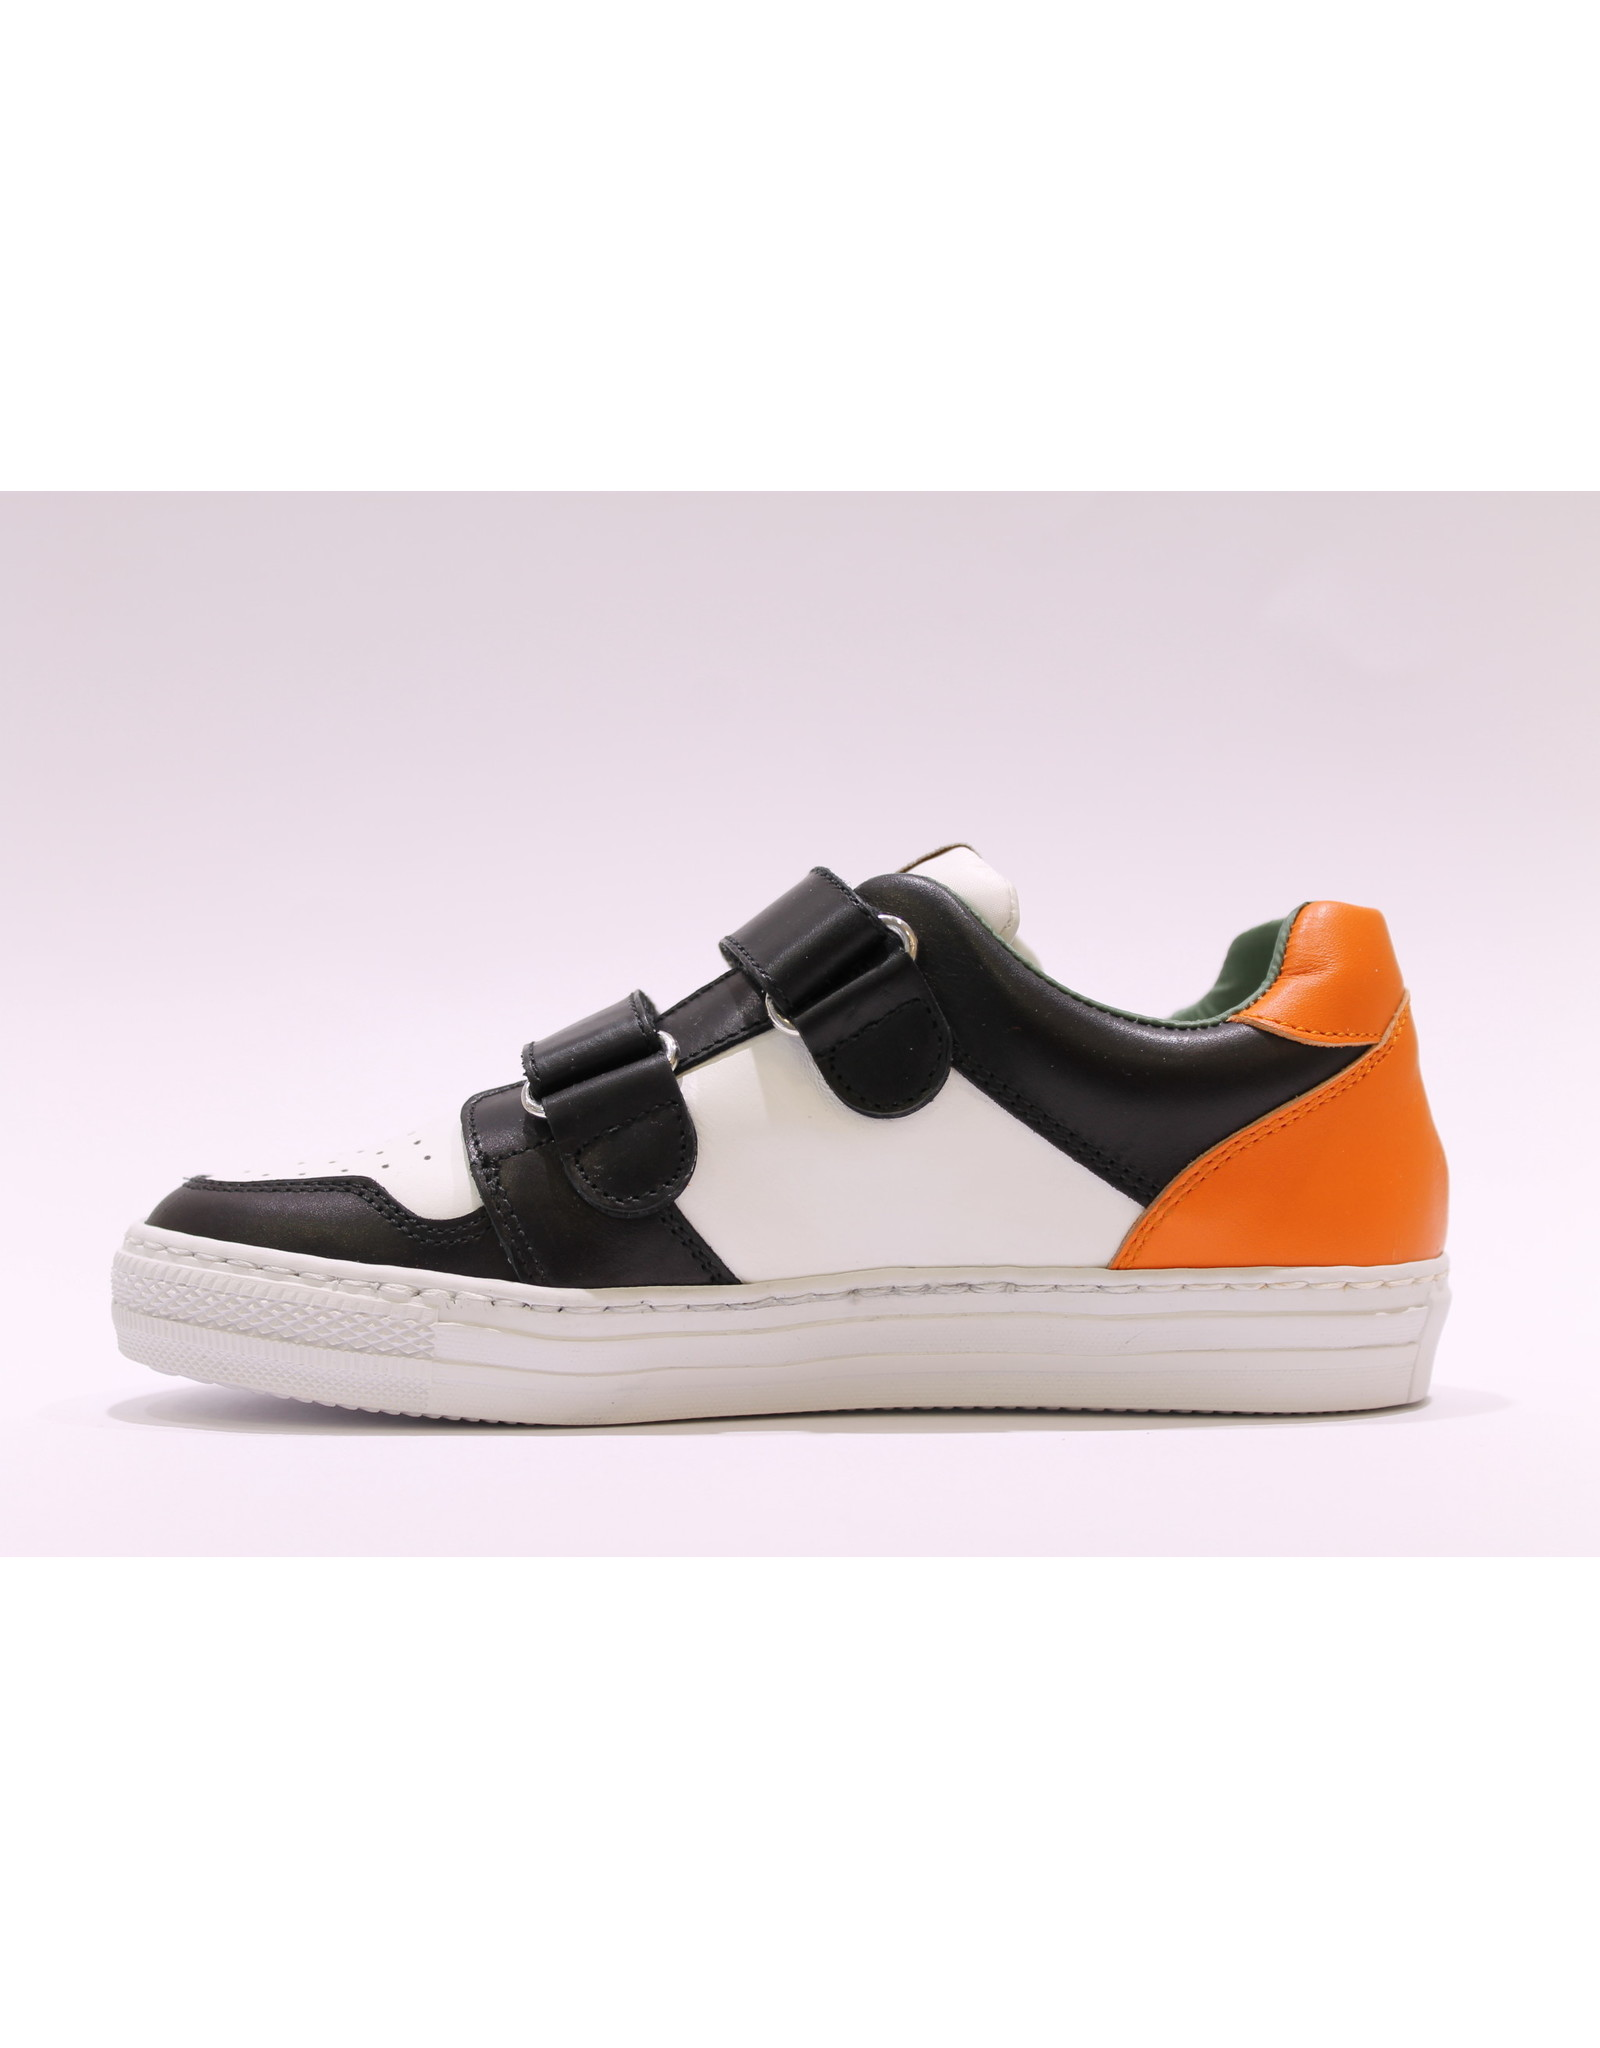 Rondinella sneaker laag zwart/wit/oranje velcro